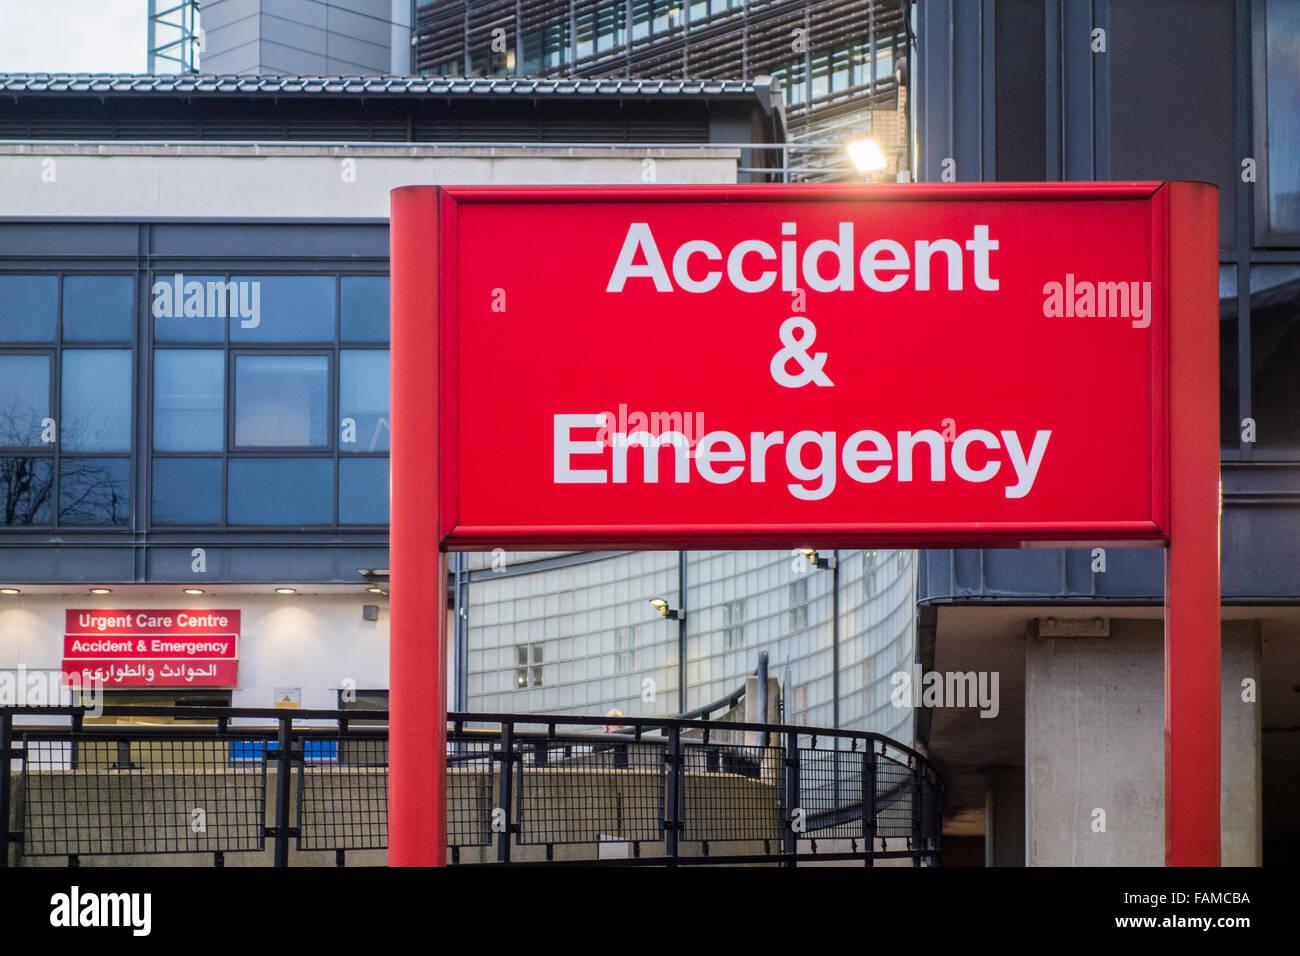 St Hospital Accident Emergency Department Stock Photos & St Hospital ...